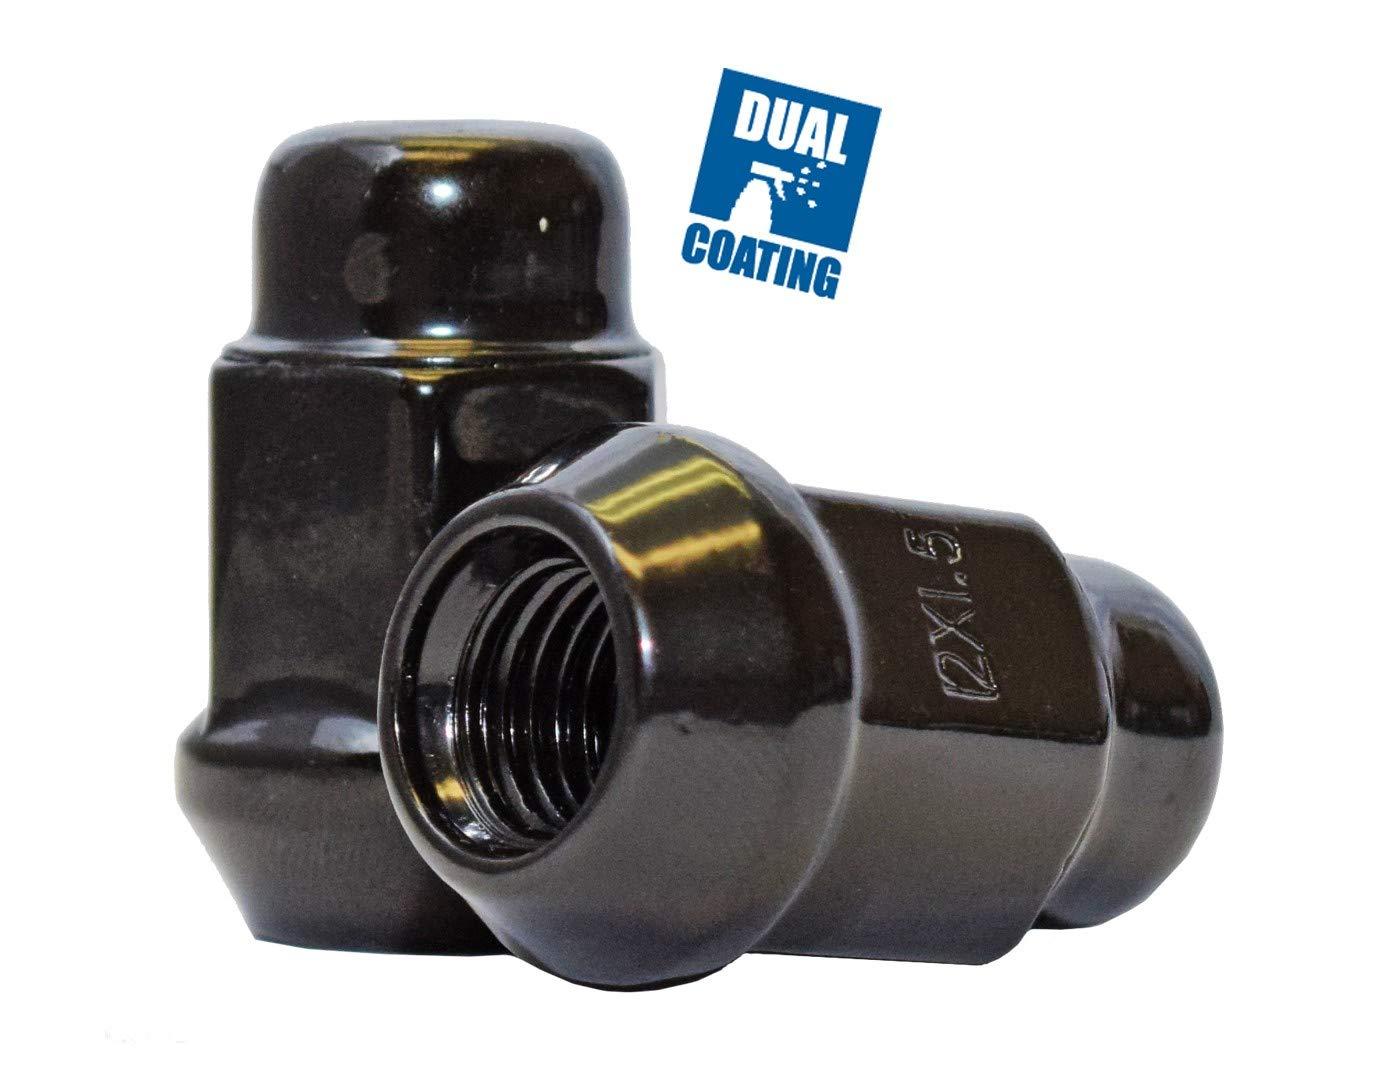 3//4 Hex Wheel Lug Nut Set of 20 Lug Nuts Closed End Bulge Acorn Lug Nut Style 1.38 Long Cone Seat 19mm M14x2.0, Chrome